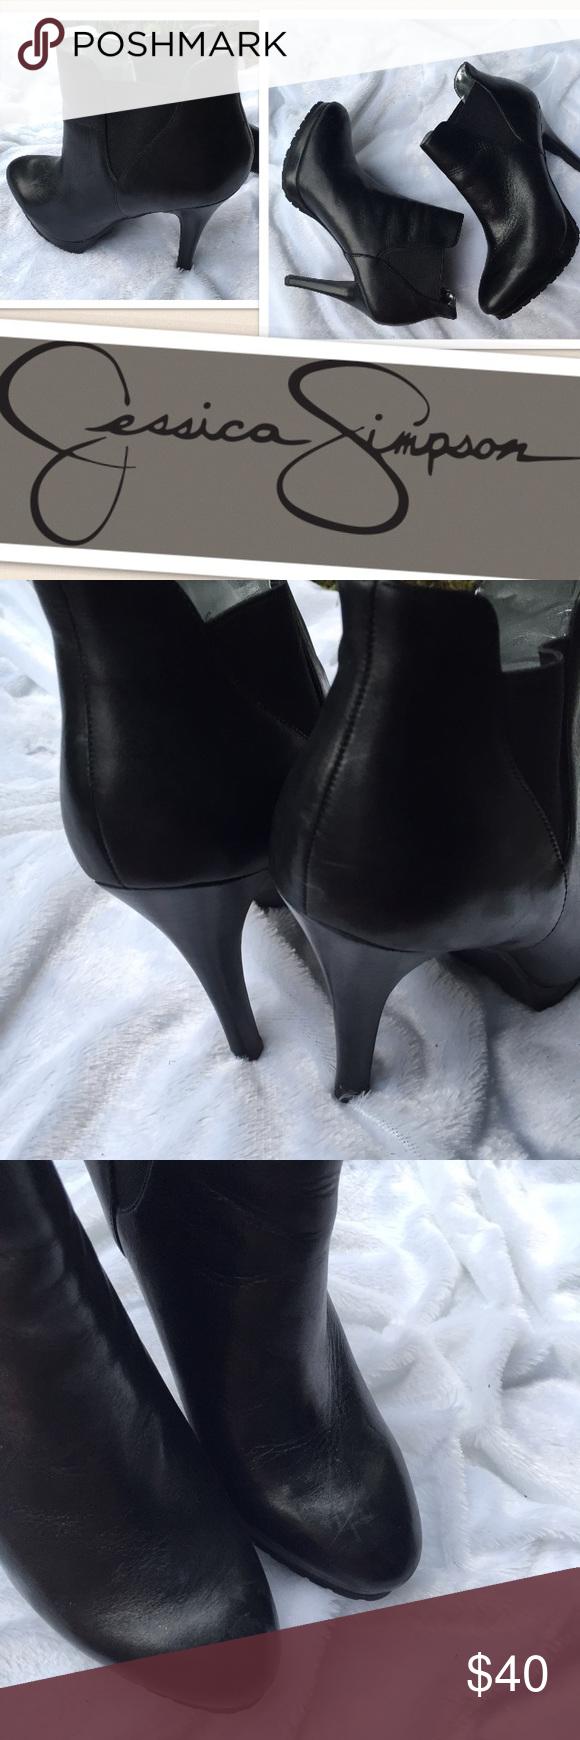 "Jessica Simpson Hensen Bootie heels sz 8.5 EUC Excellent pre-loved condish. Flawless. 4.25"" heel. 1/2"" platform. Sz 8.5 Jessica Simpson Shoes Ankle Boots & Booties"